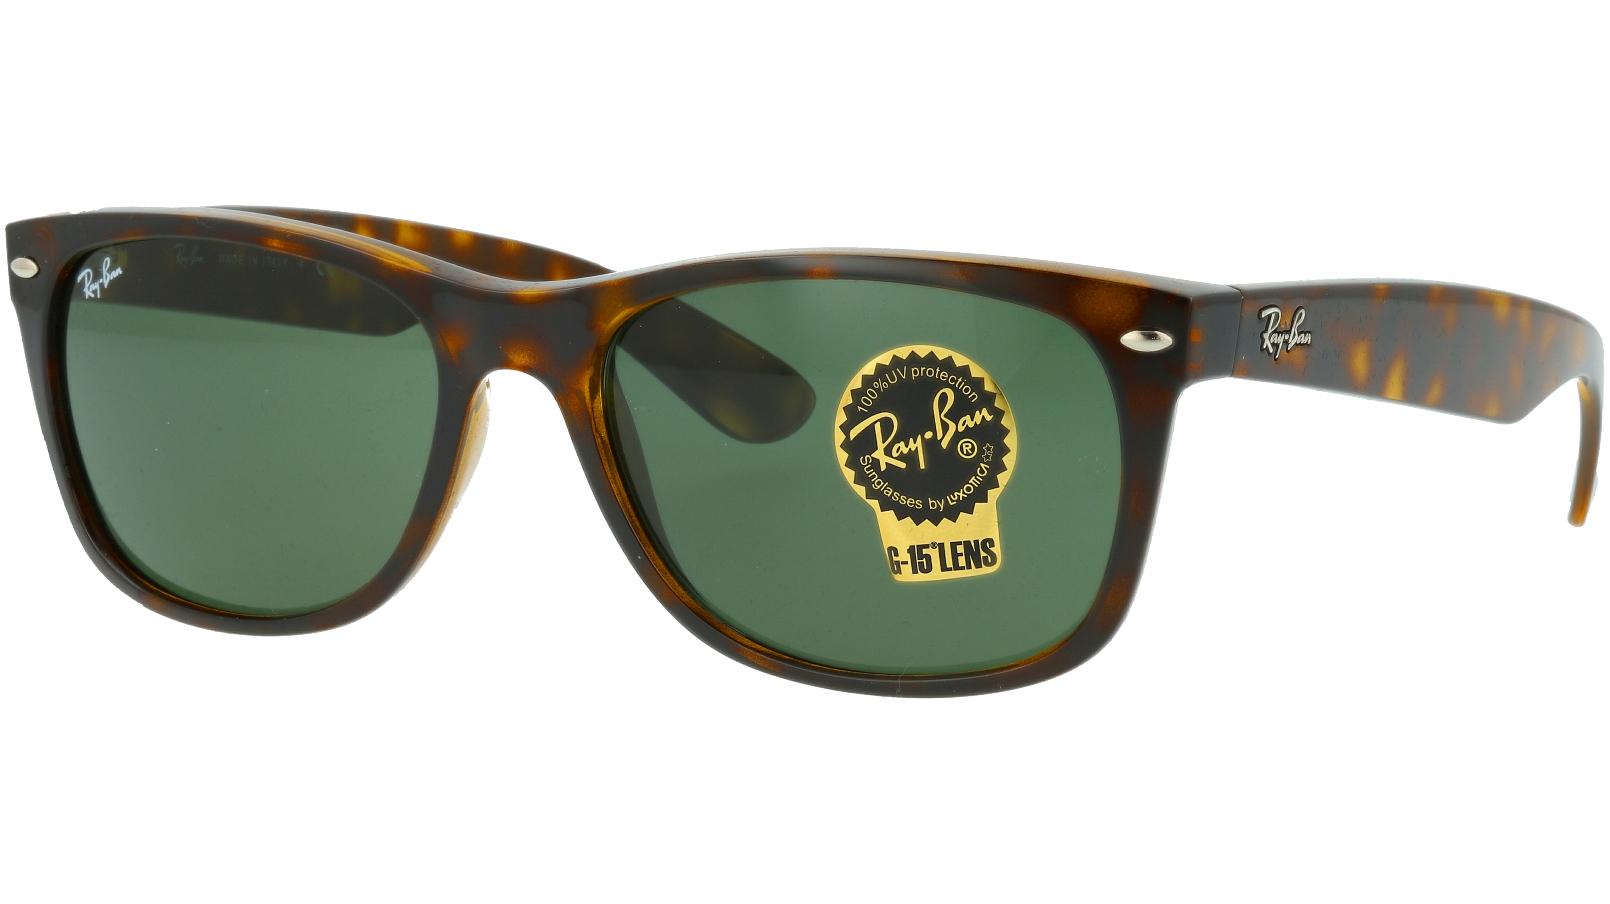 Ray-Ban RB2132 902 58 Tortoise Wayfarer Sunglasses